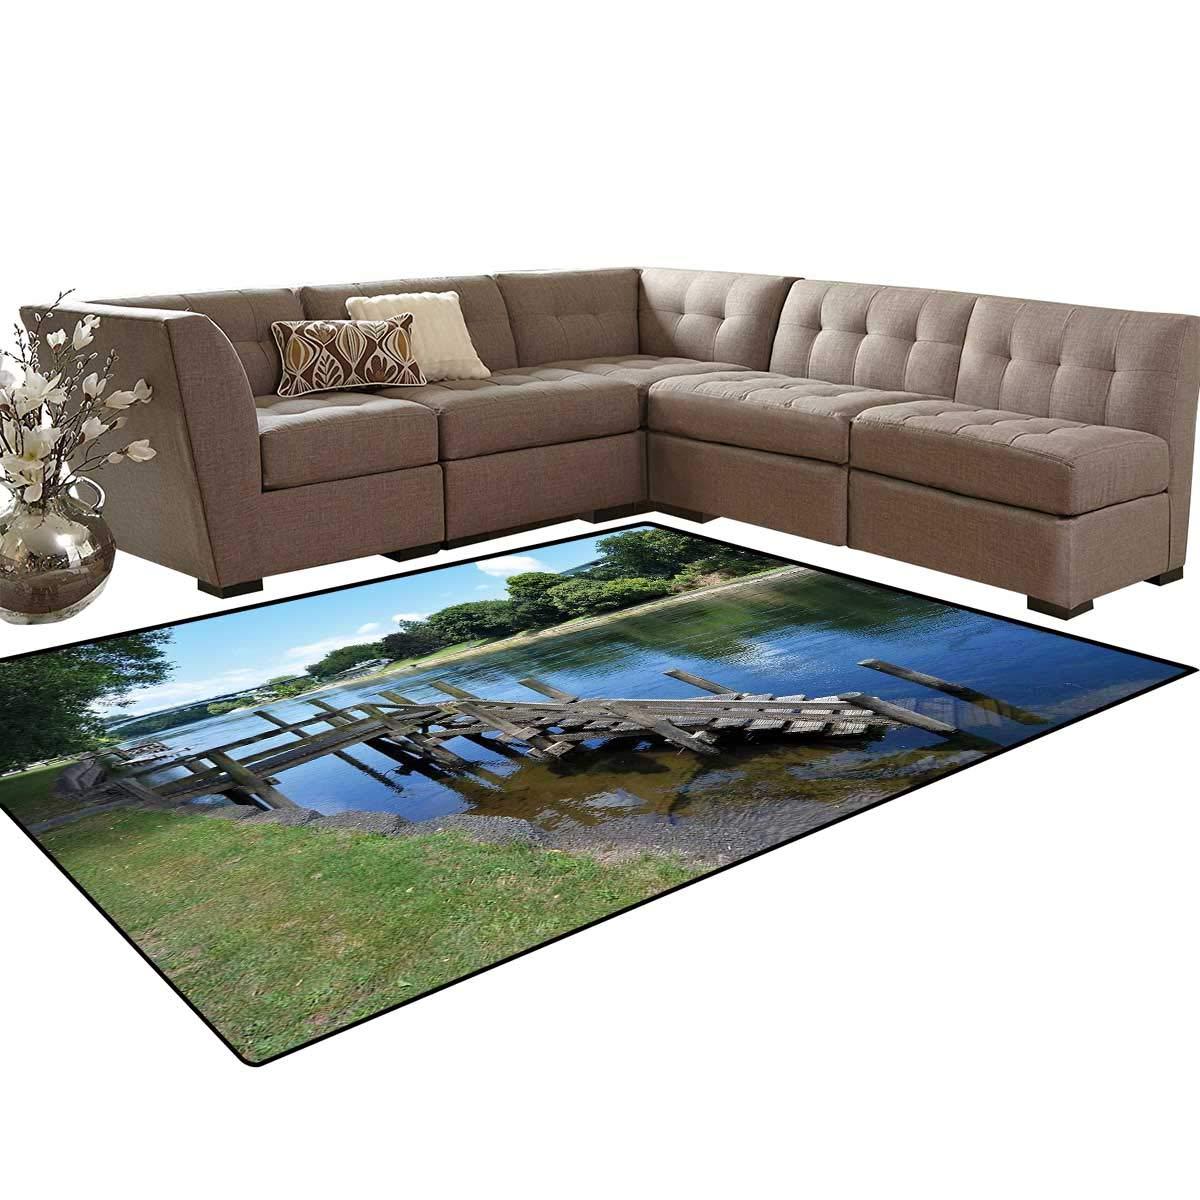 Outdoor bath mat 3d digital printing mat waikato river hamilton city new zealand holiday destination travel landmark extra large area rug 66 x10 green